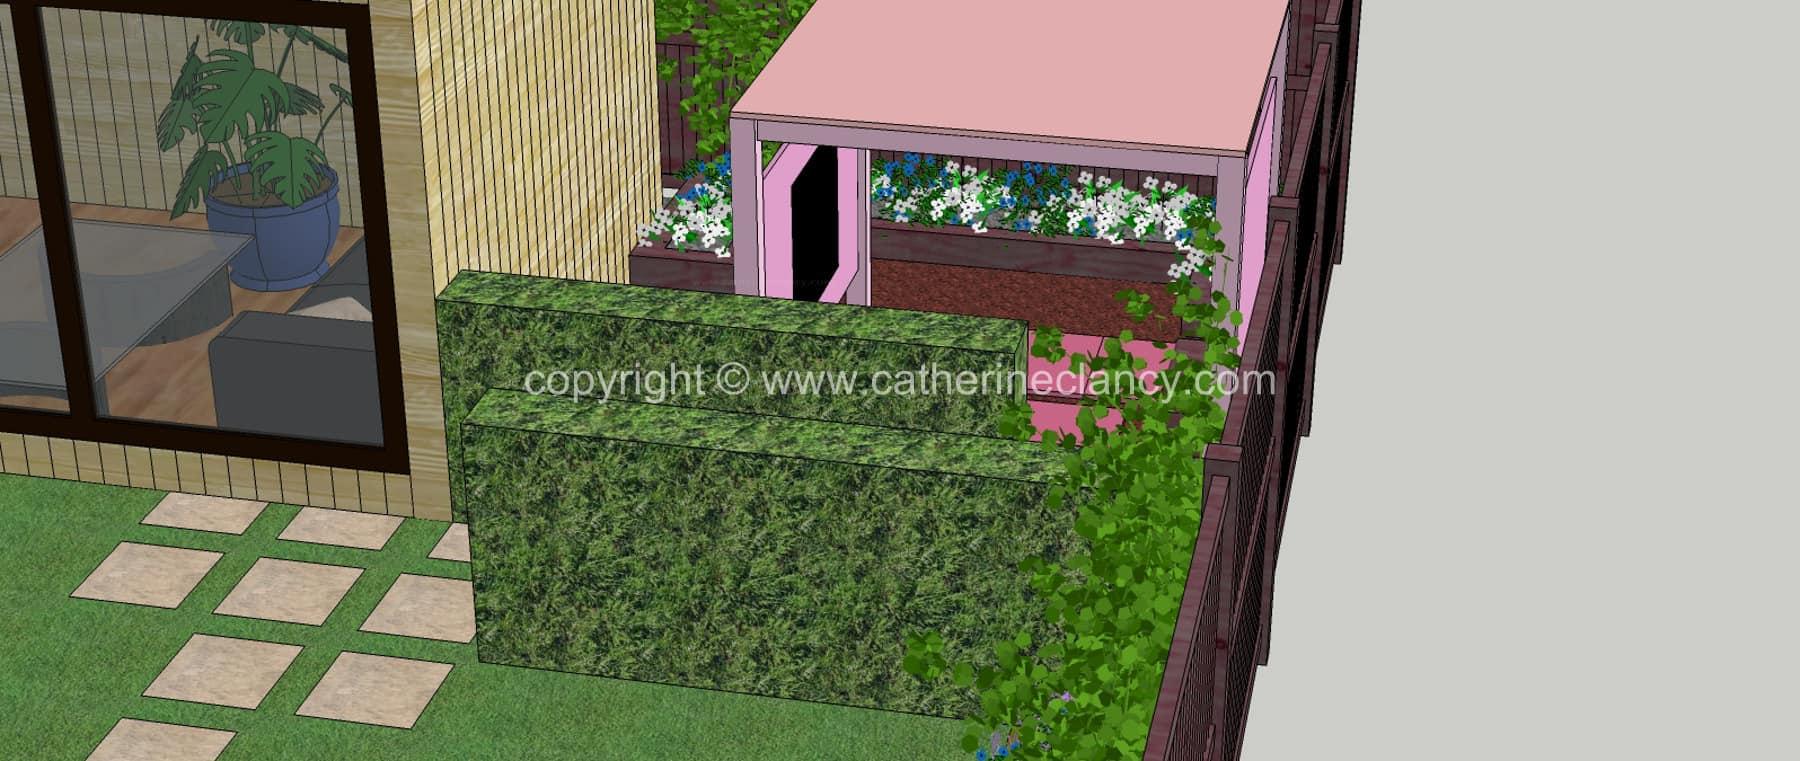 ecostudio-garden-london-7